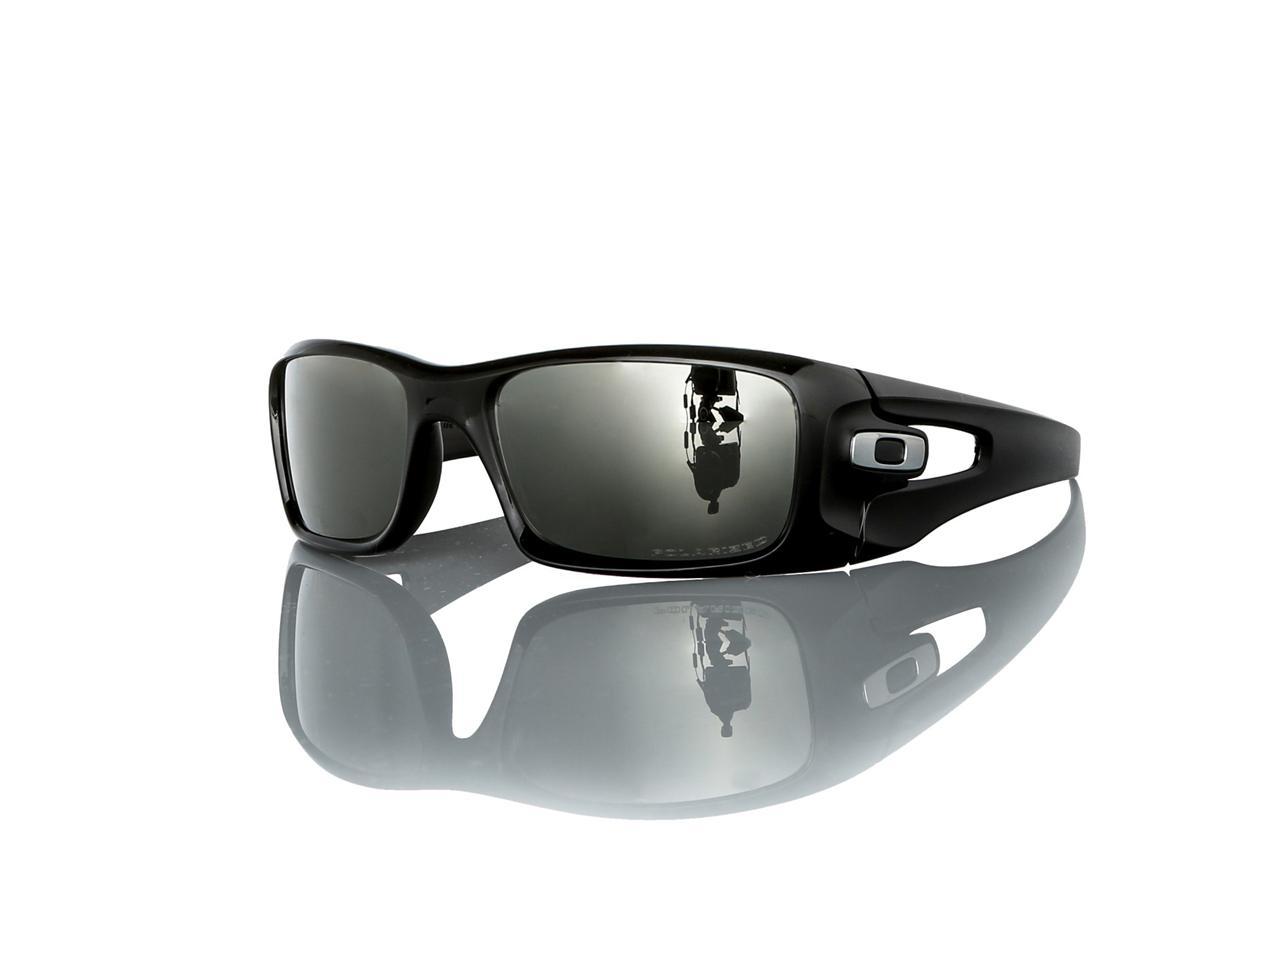 New Authentic Mens Oakley Sunglasses Crankcase 9165/01/02 ...